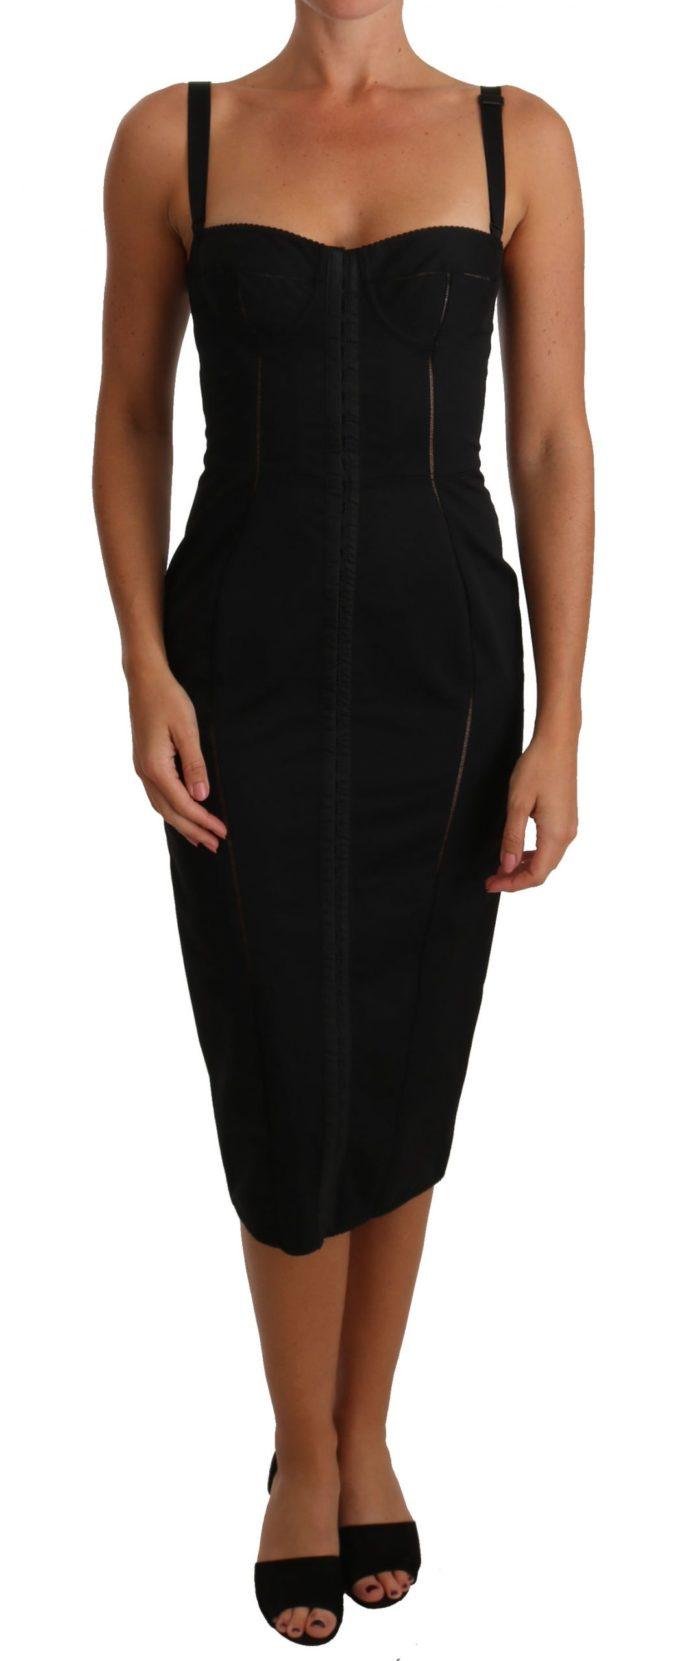 635218 Black Stretch Lbd Coctail Bustier Corset Dress.jpg